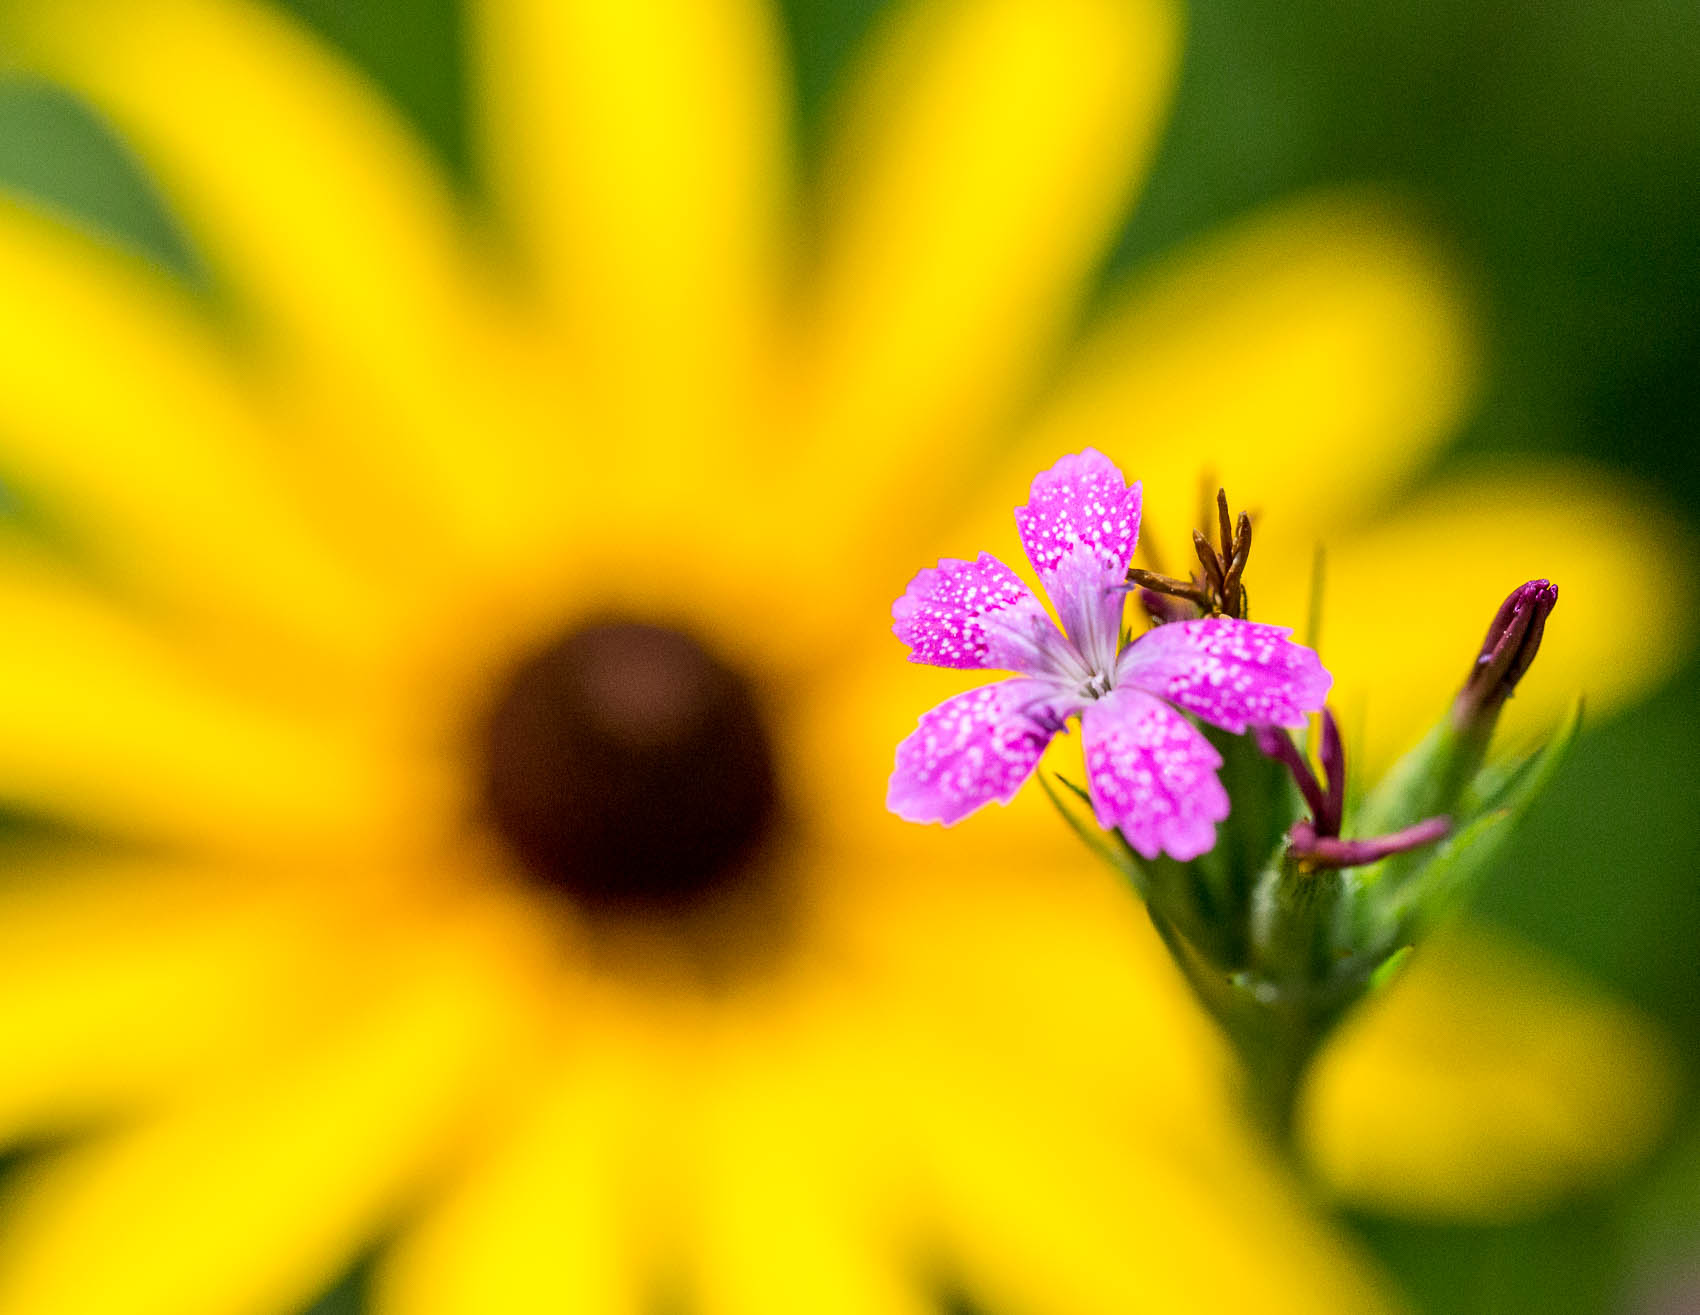 close ups of flowers